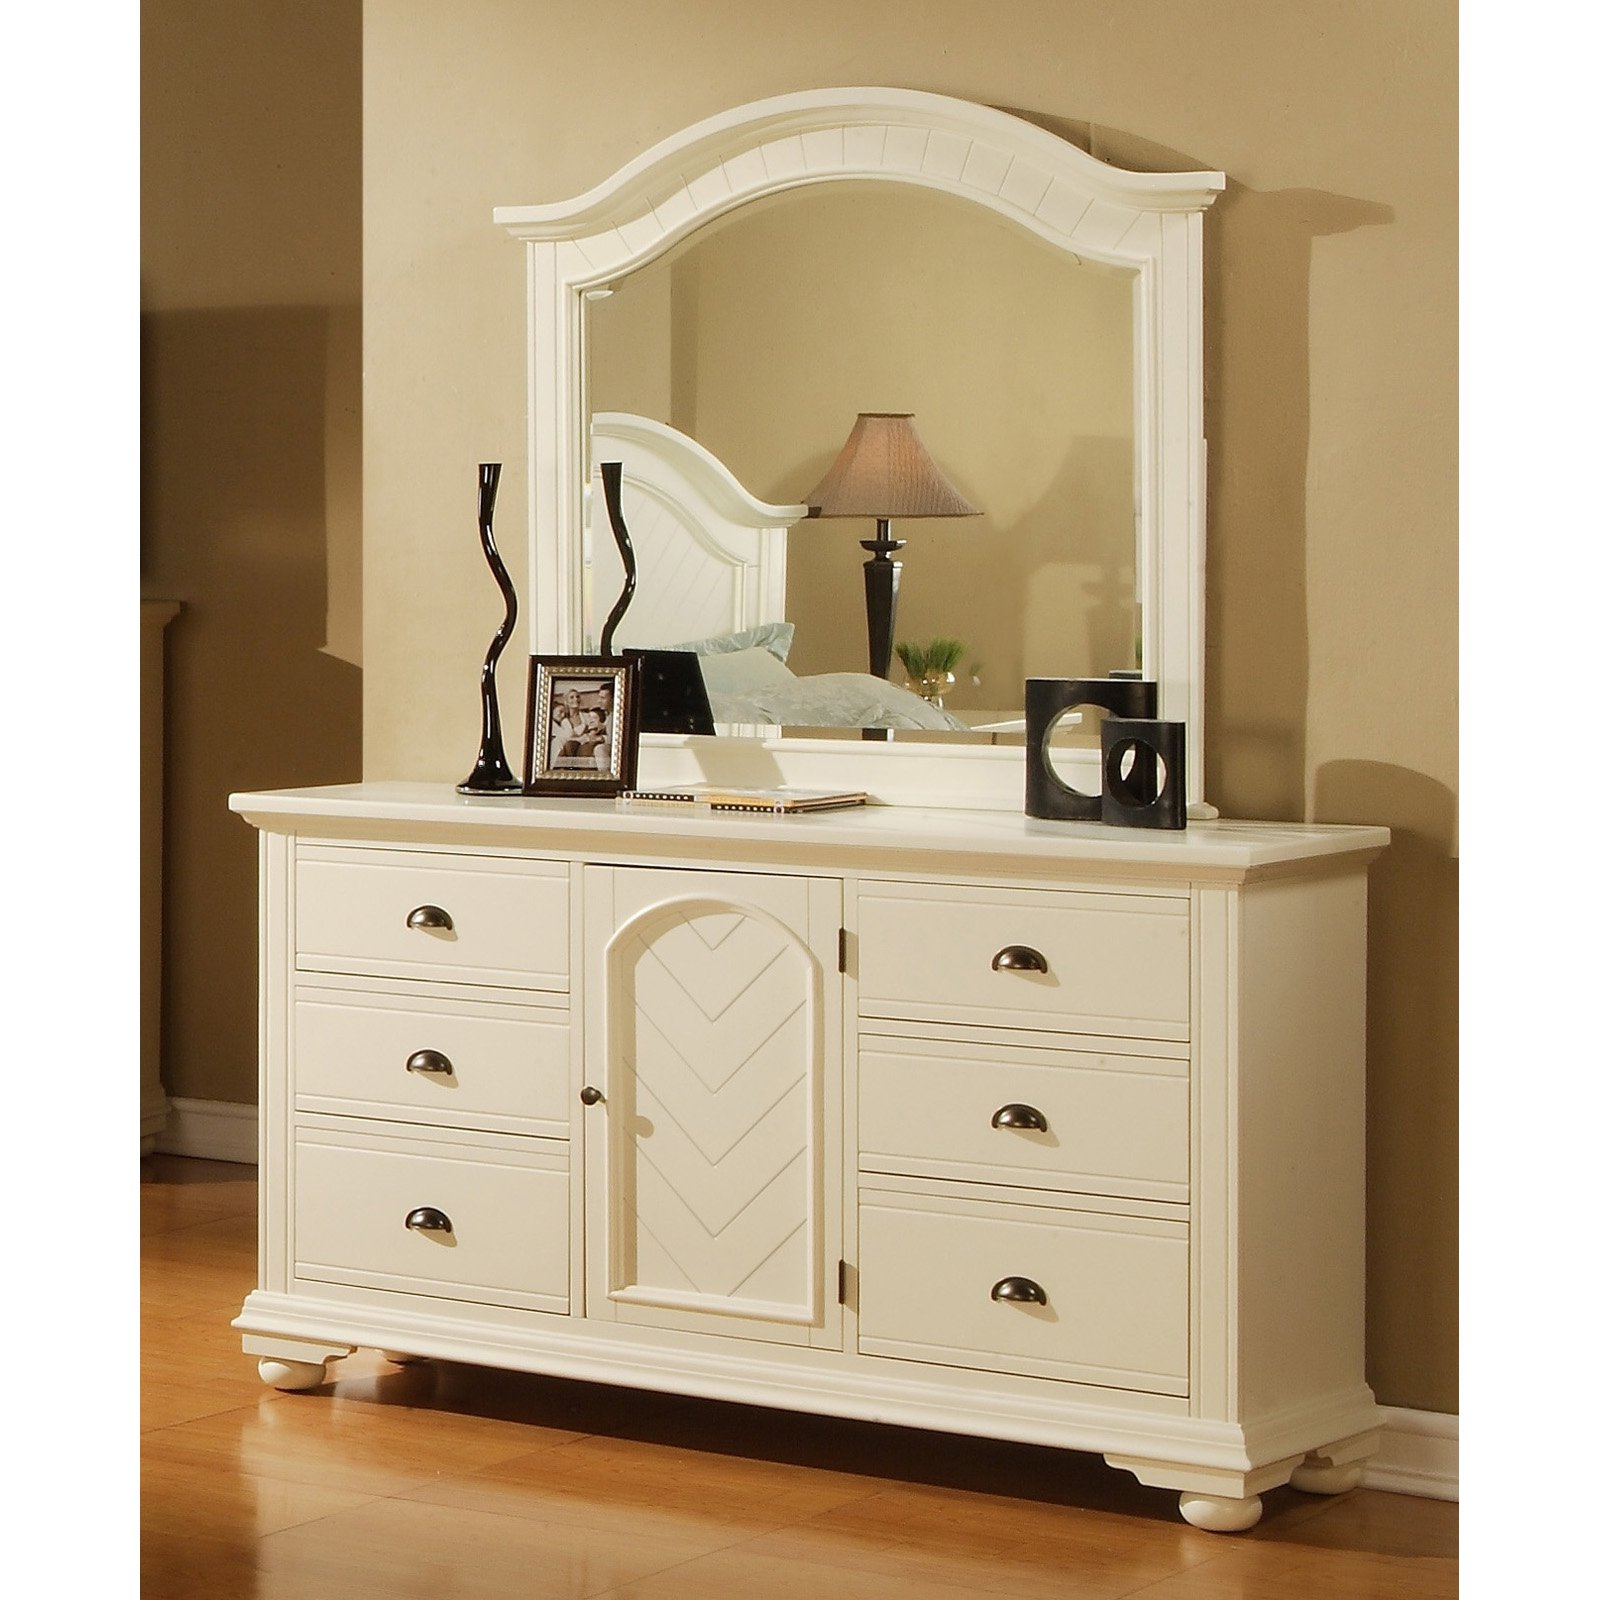 Picket House Furnishings Brook 6 Drawer 1-Door Dresser - Cottage White